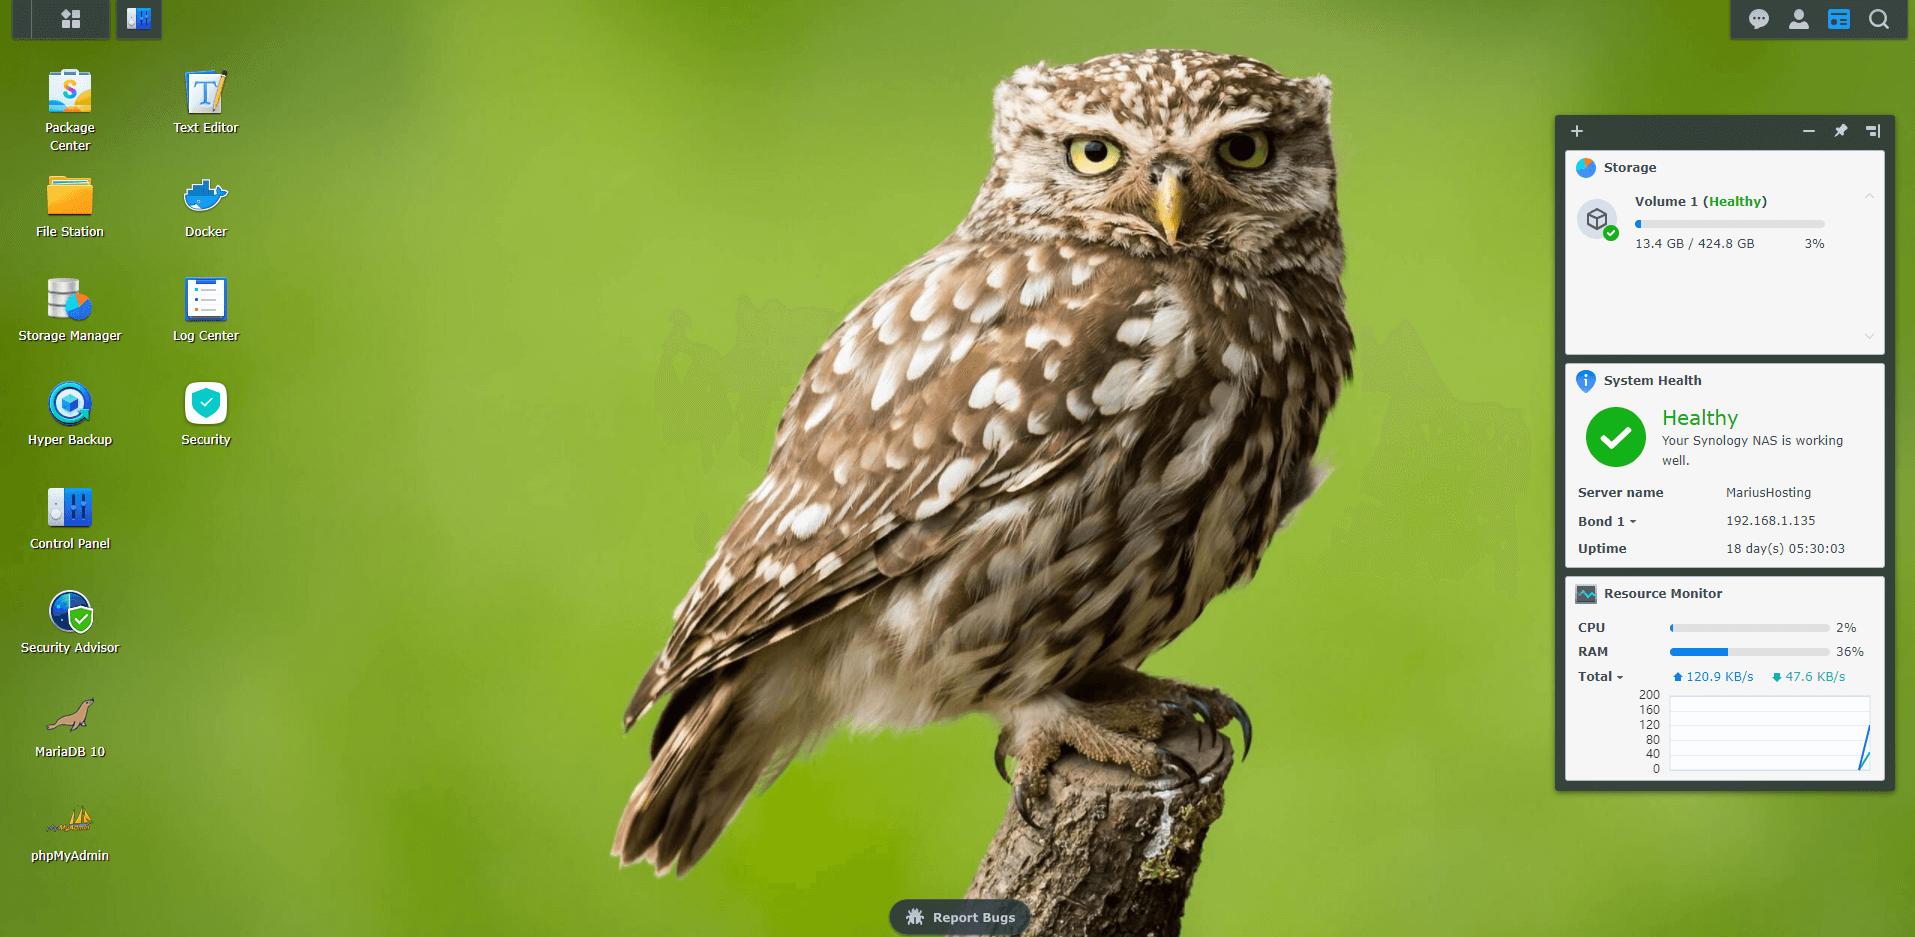 3 Synology Owl Wallpaper